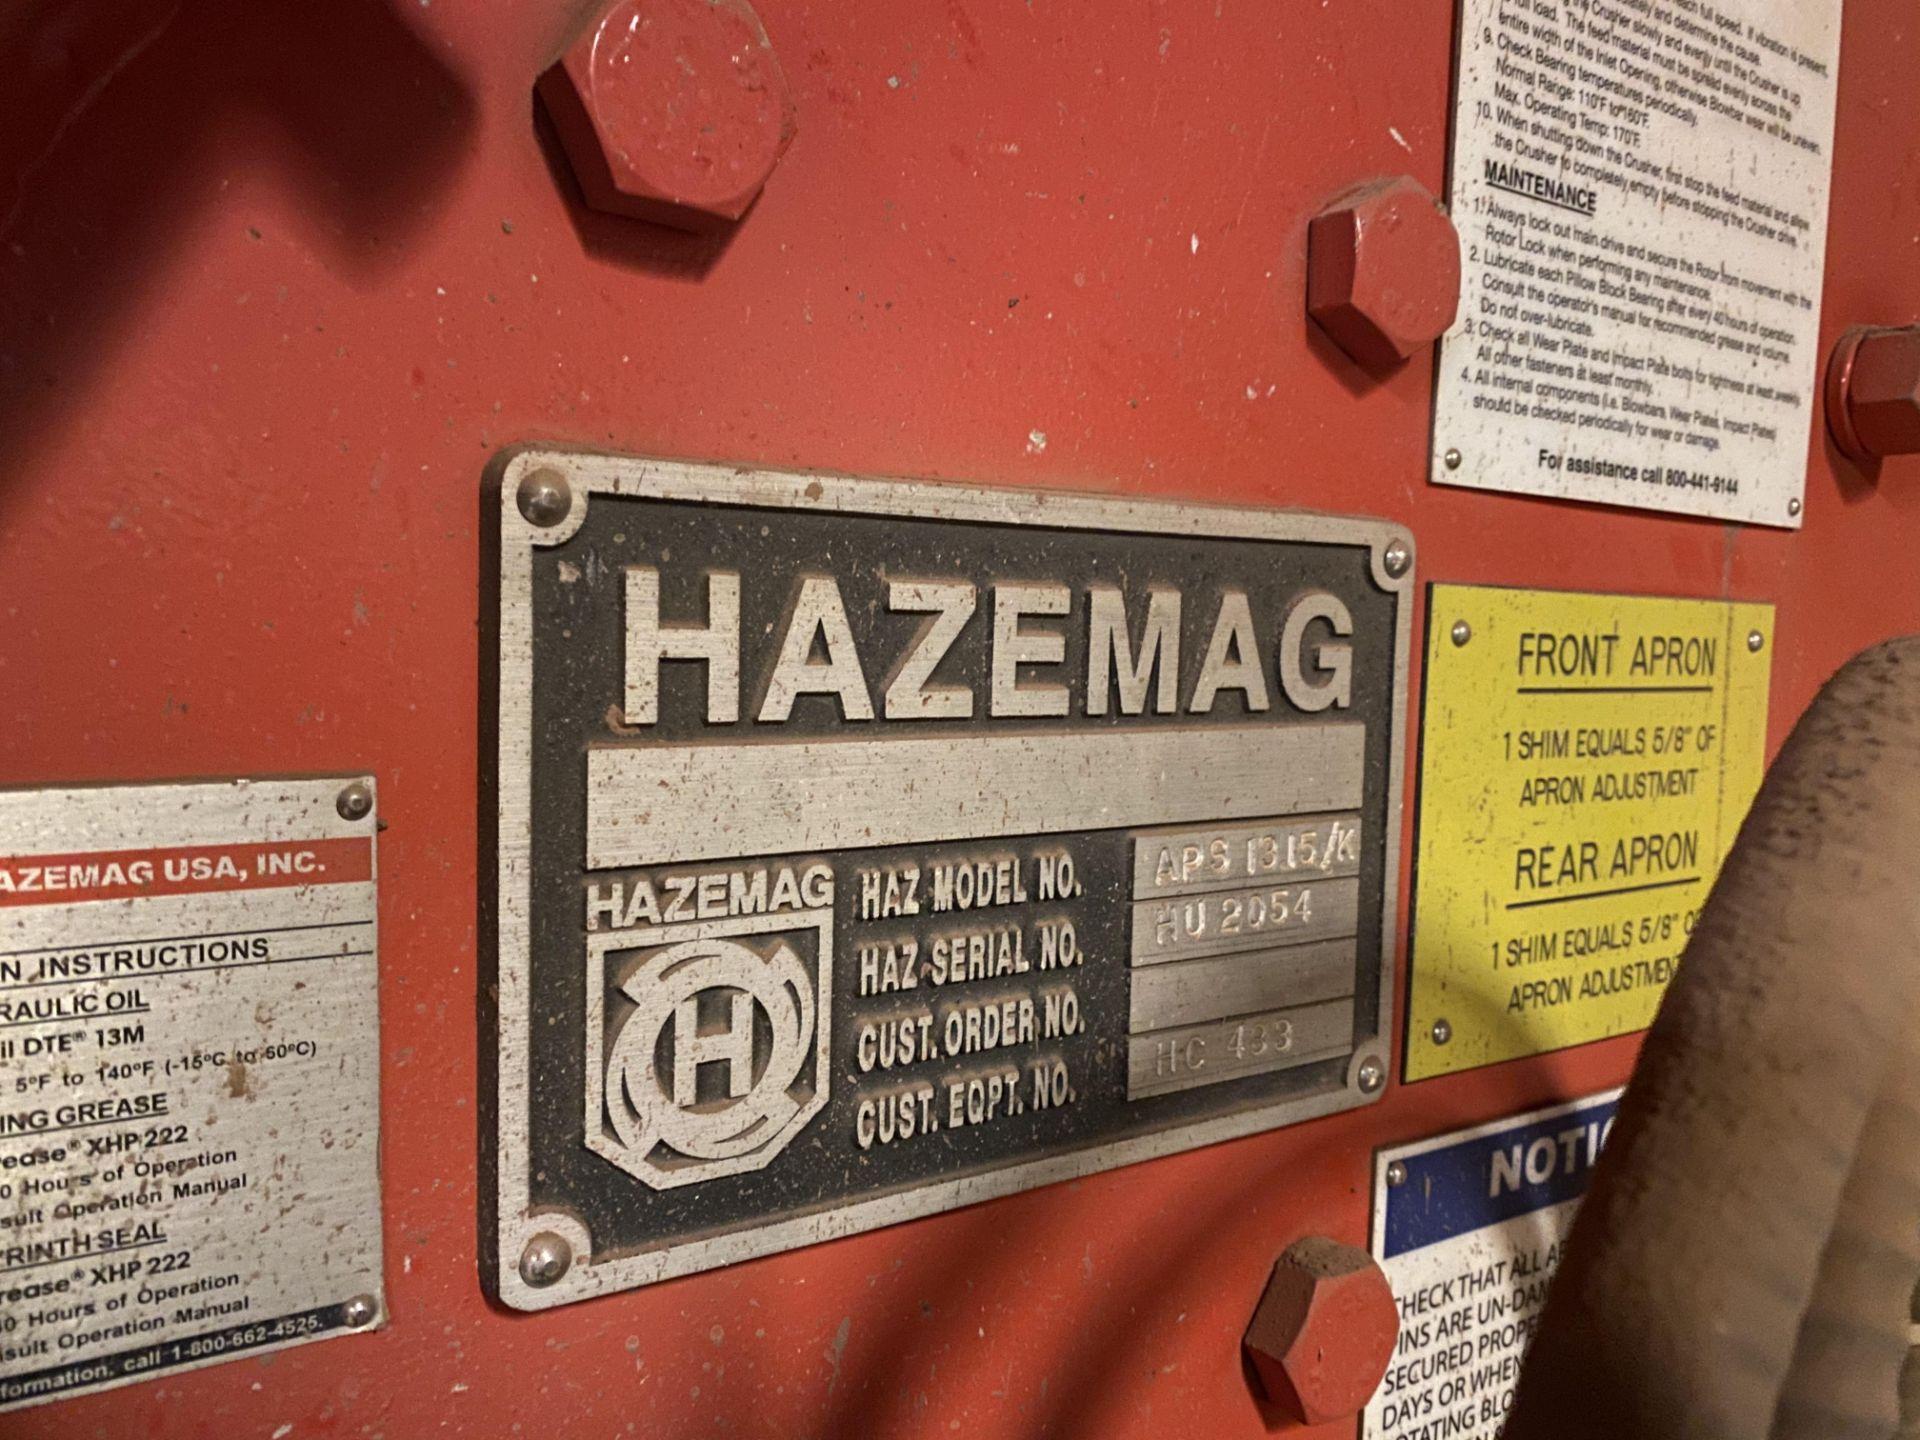 HAZEMAG IMPACT CRUSHER, MODEL 1315, 60'' DIAMETER ROTOR, 60'' WIDE, 575V, 450 HP - Image 2 of 25